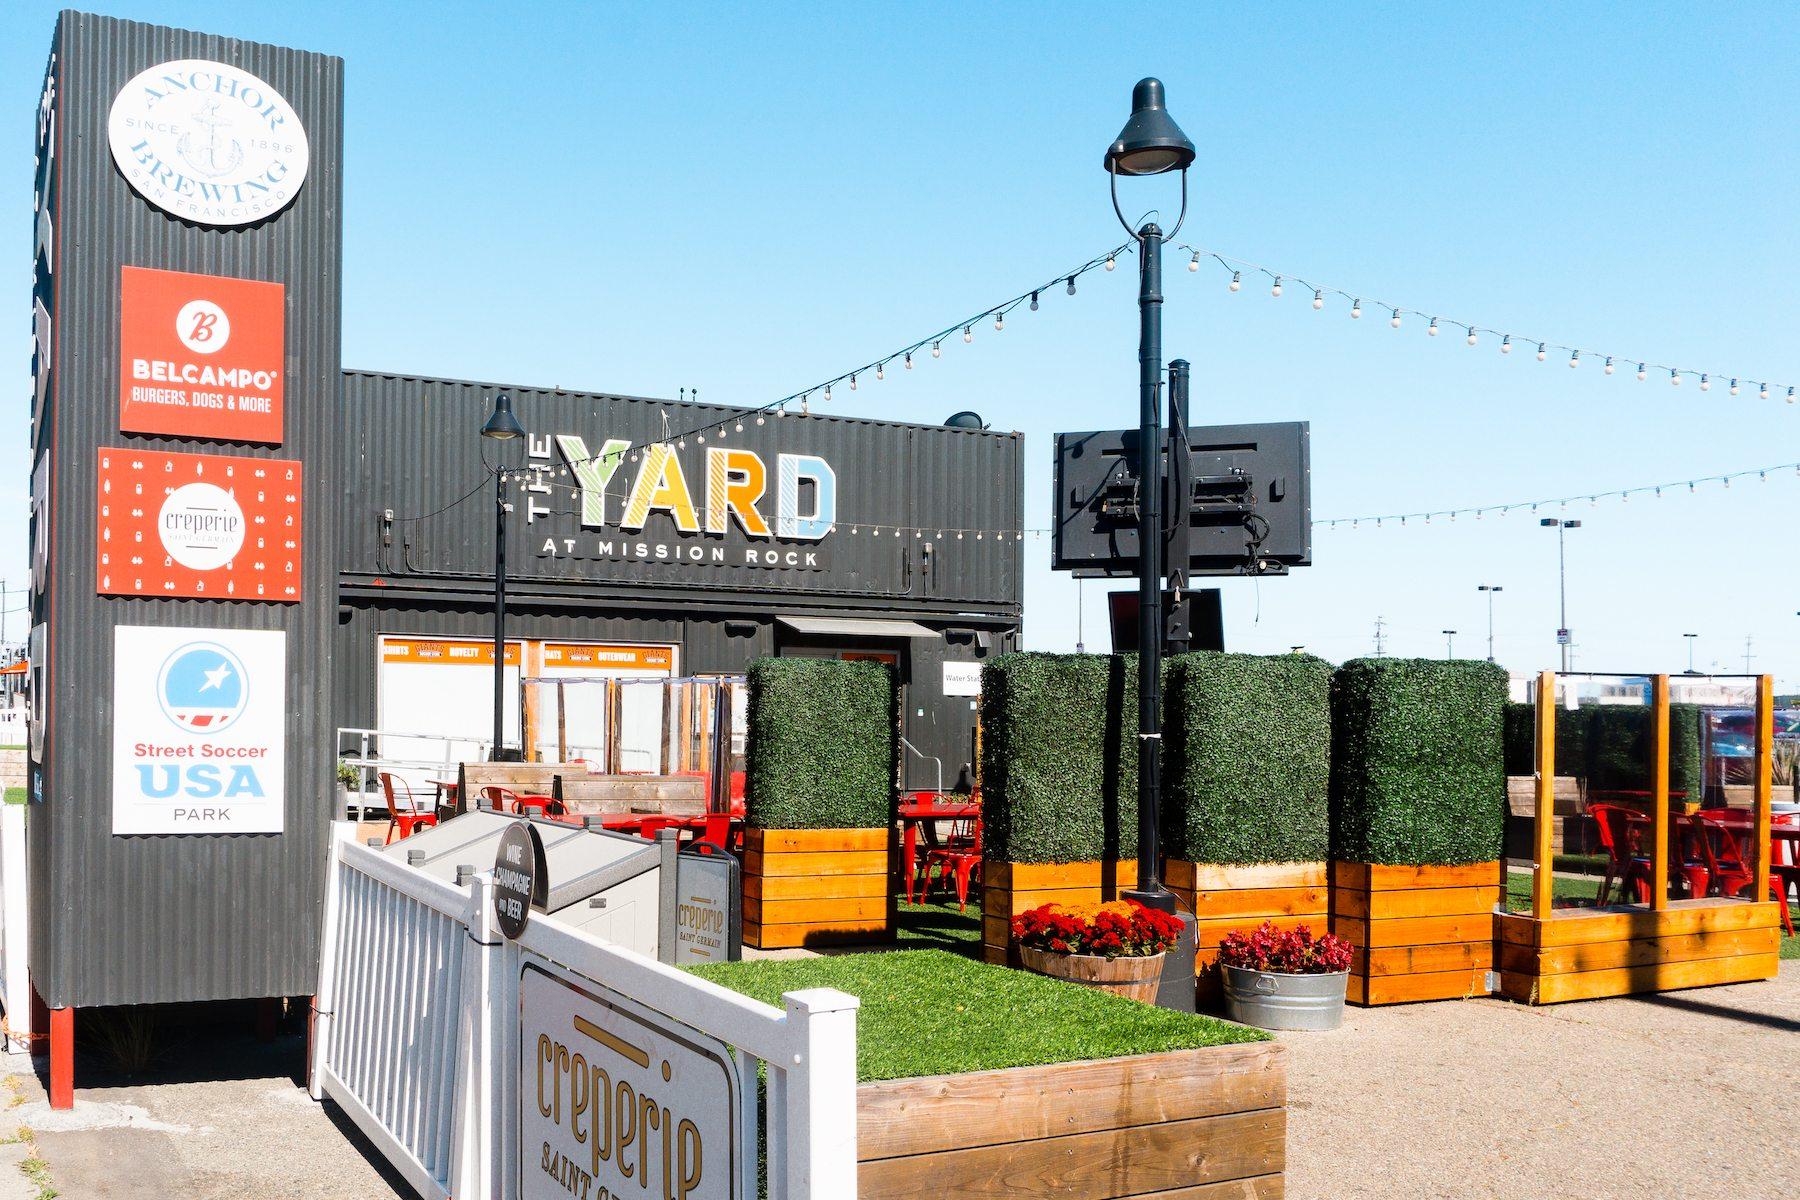 The Yard. Photo: Justin Wong, 49miles.com.